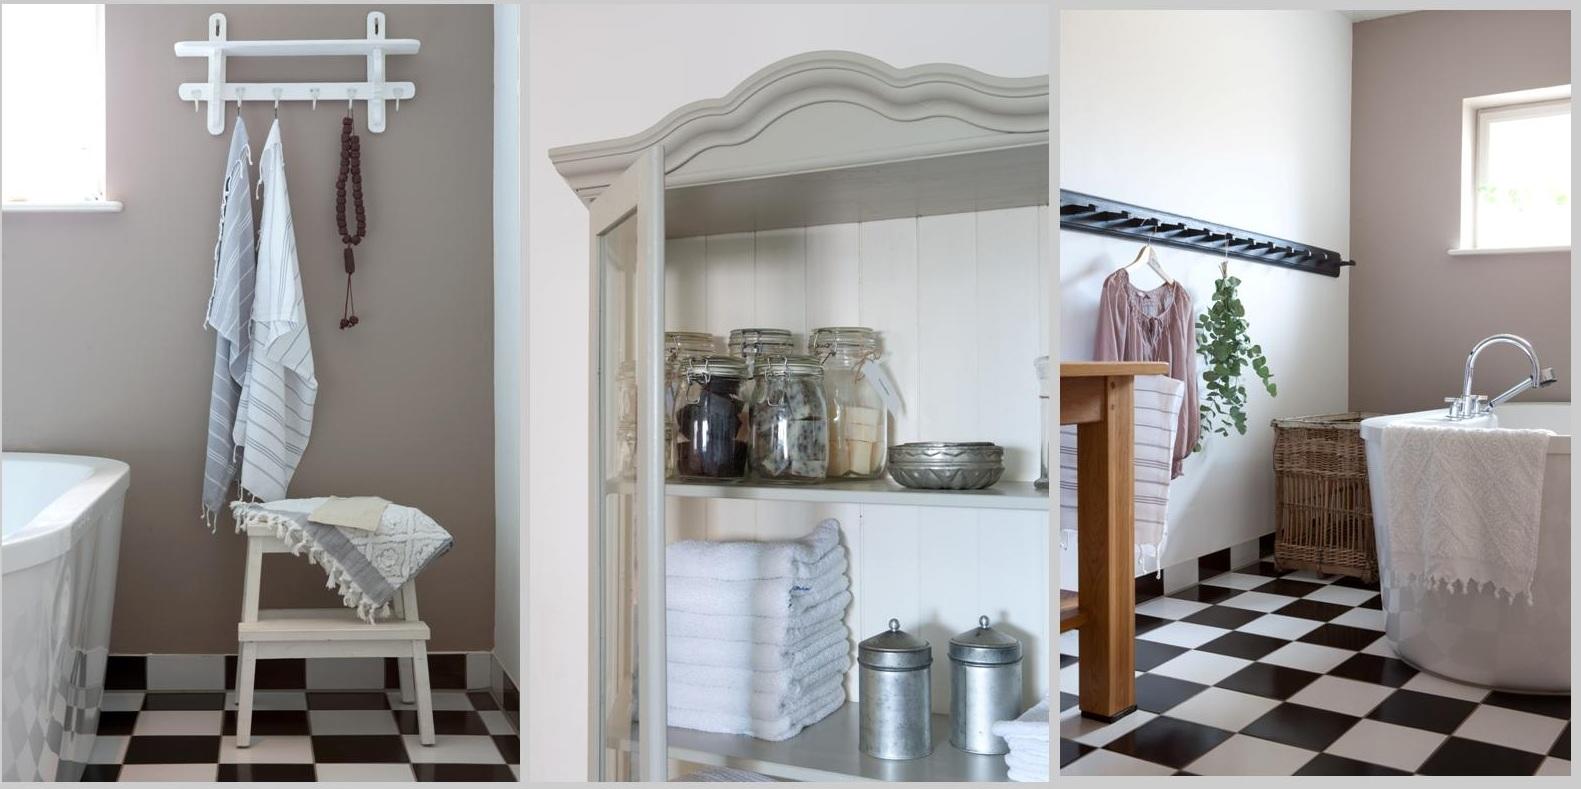 Badkamer feng shui interieur meubilair idee n - Kleur feng shui badkamer ...